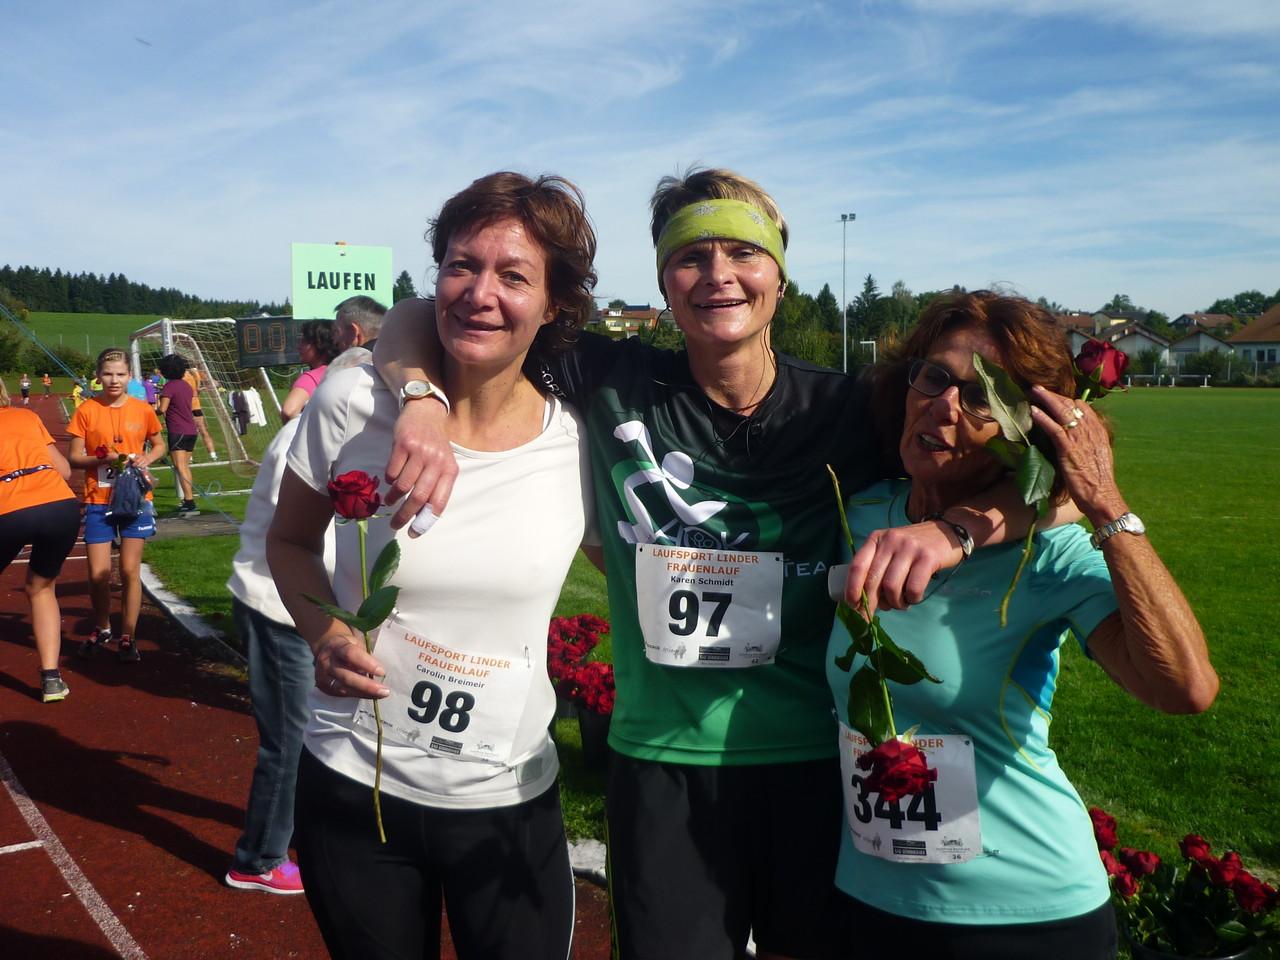 Carolin, Karen, Hannelore